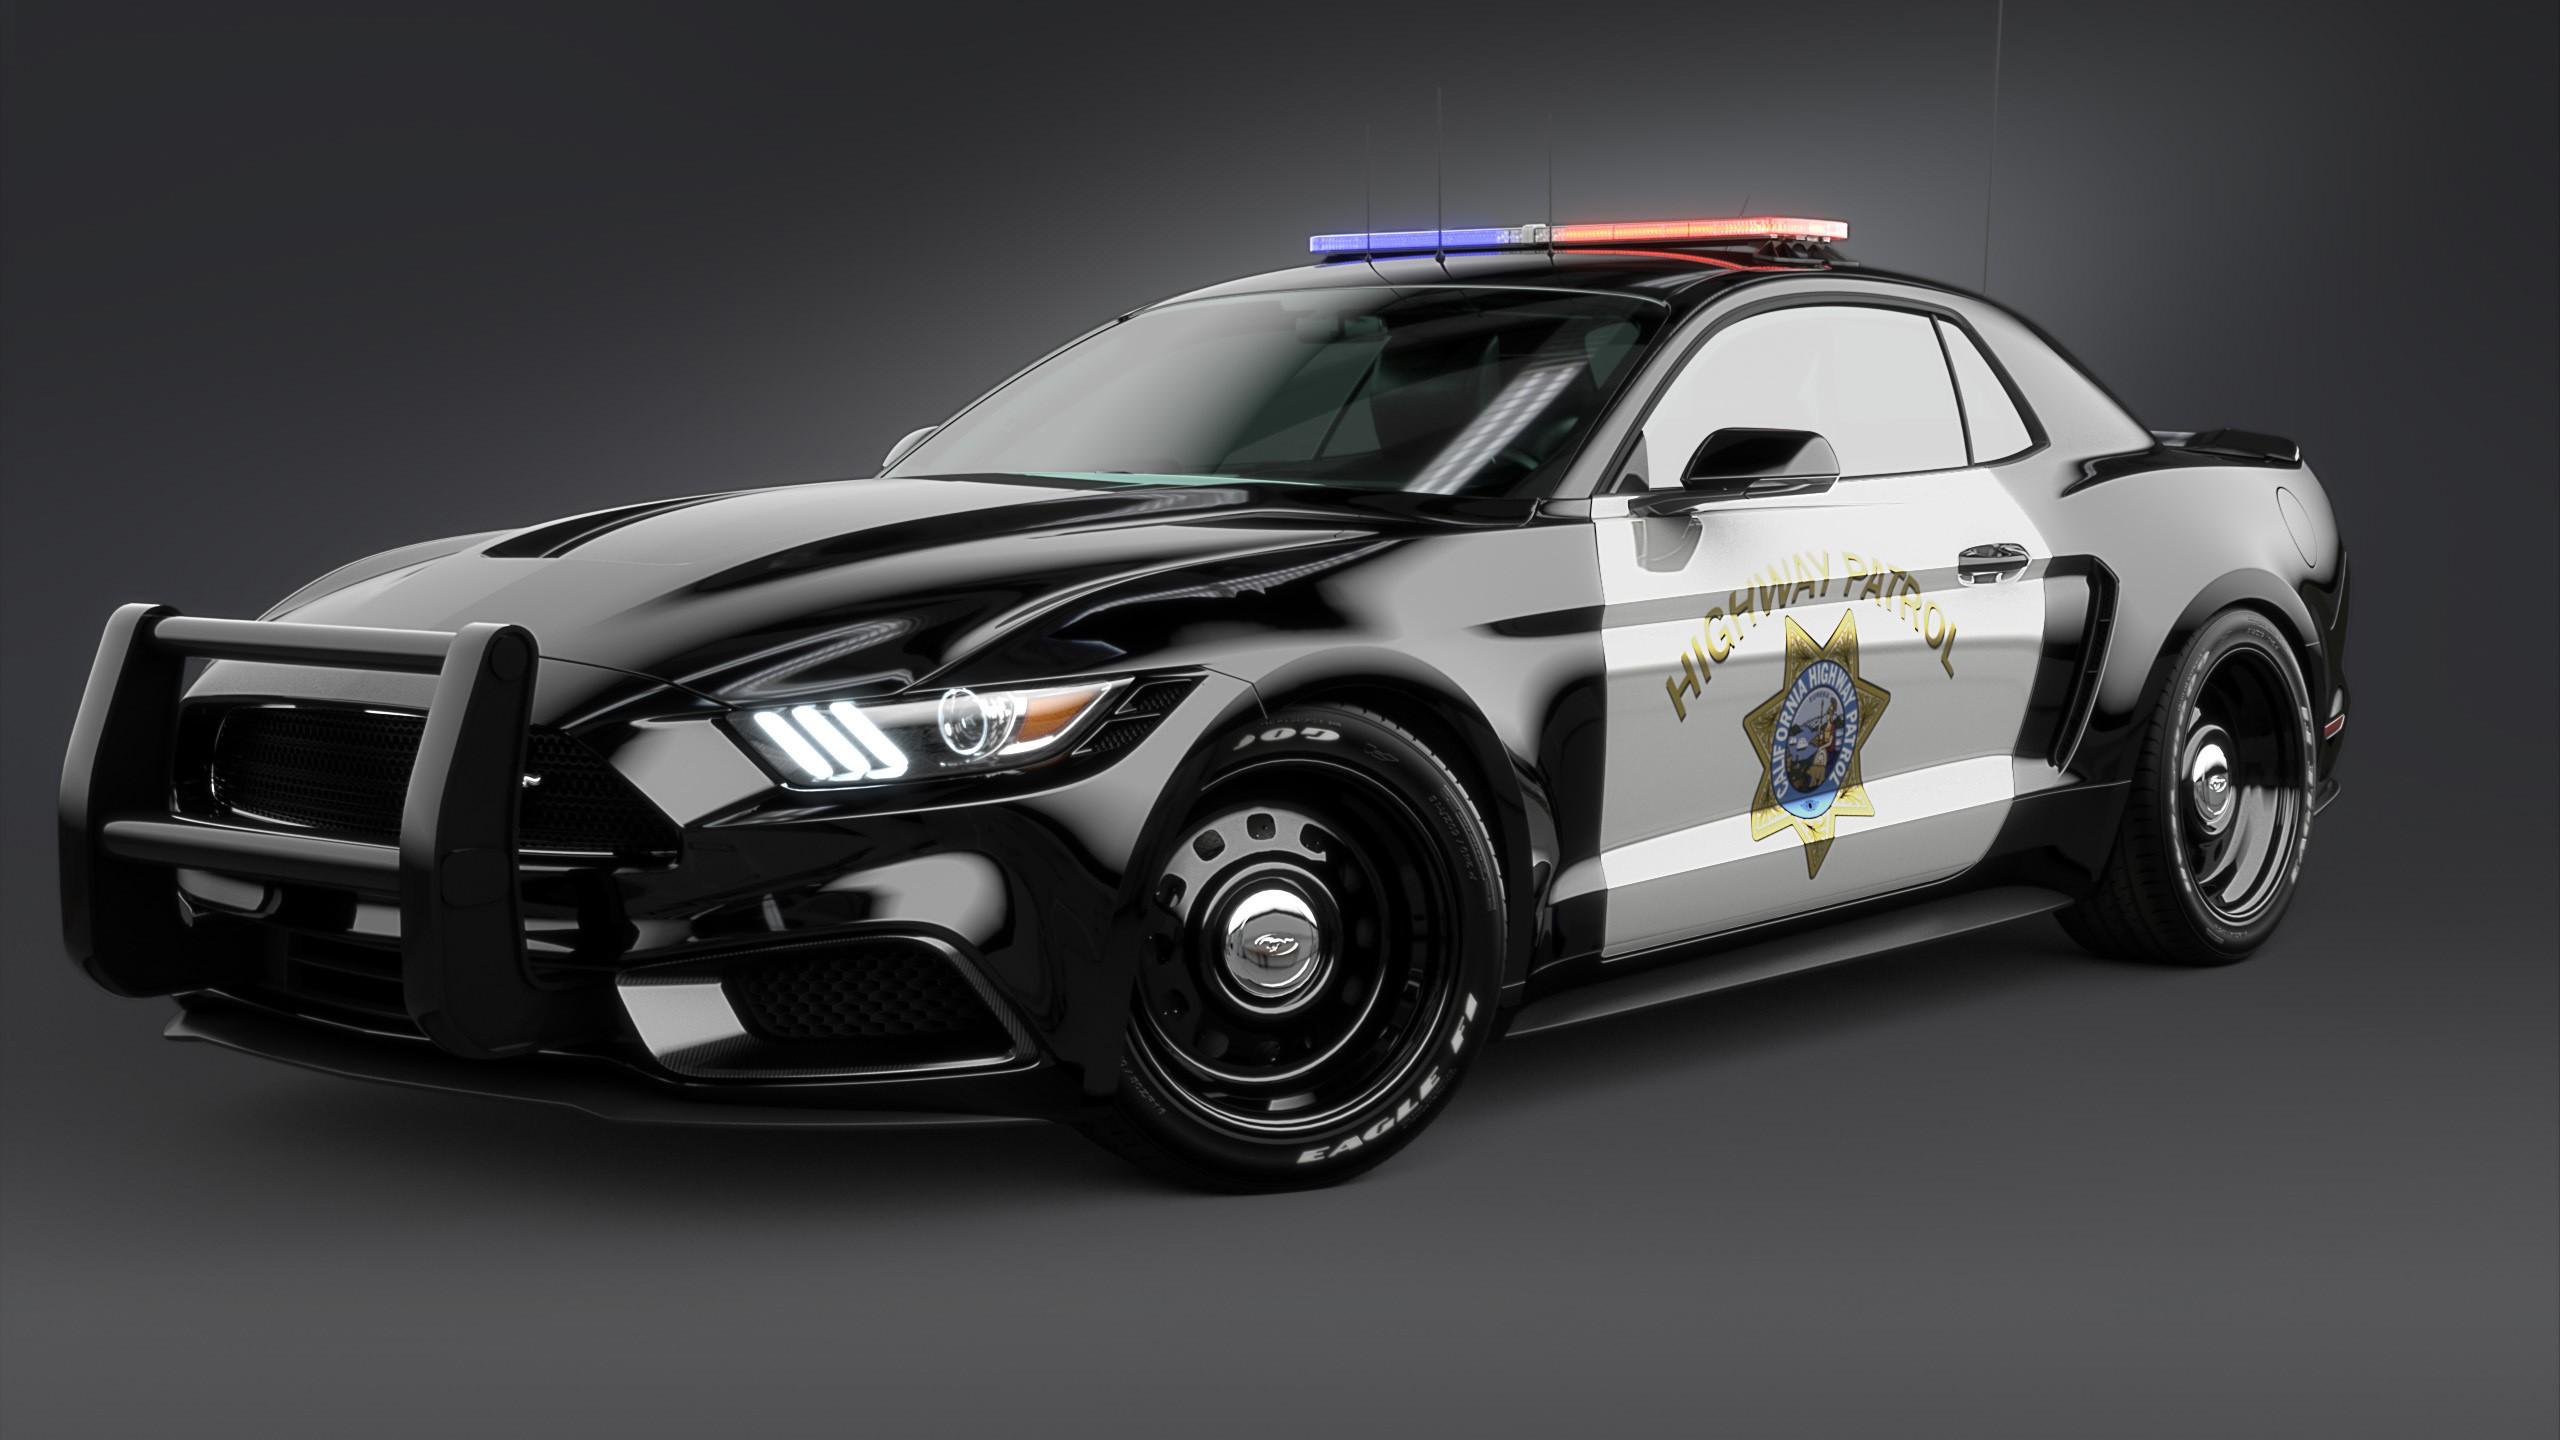 2017 Ford Raptor Hd Wallpaper 2017 Ford Mustang Notchback Design Police 2 Wallpaper Hd